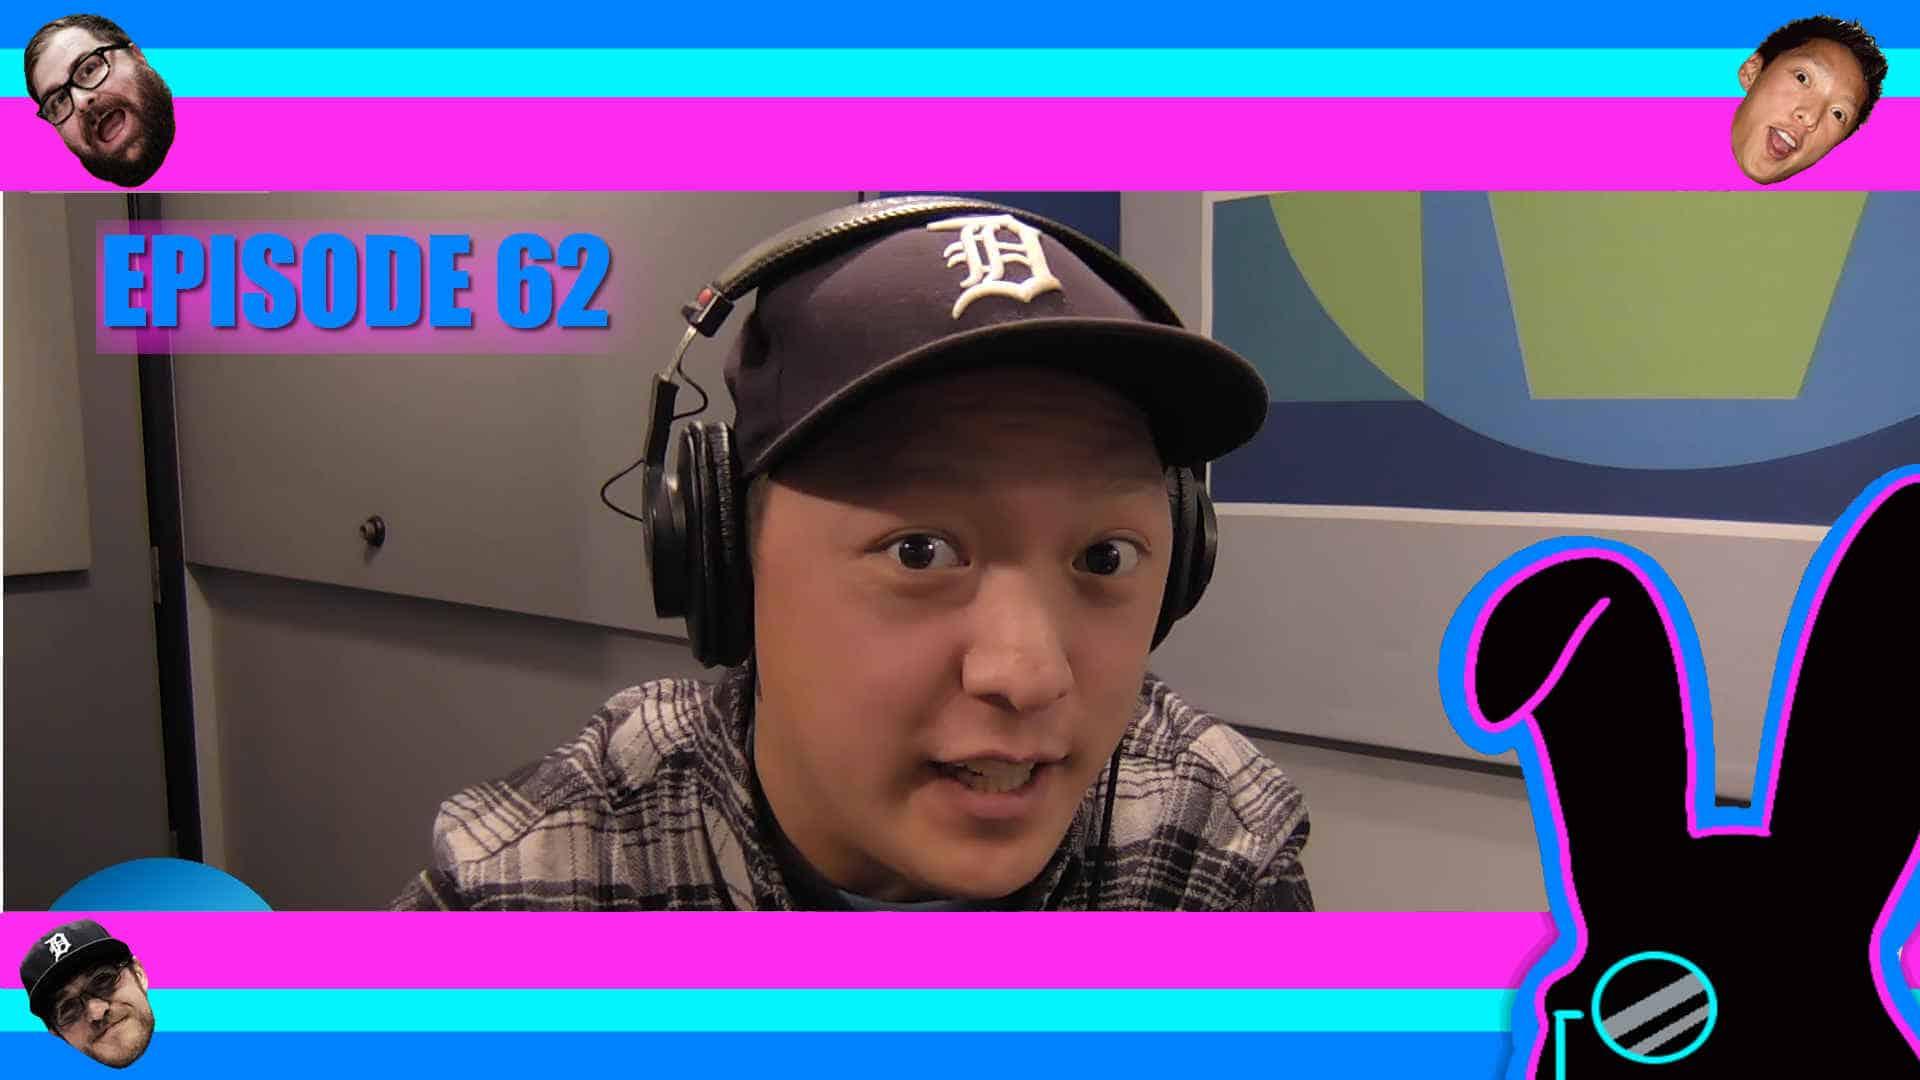 Geektainment Weekly - Episode 62